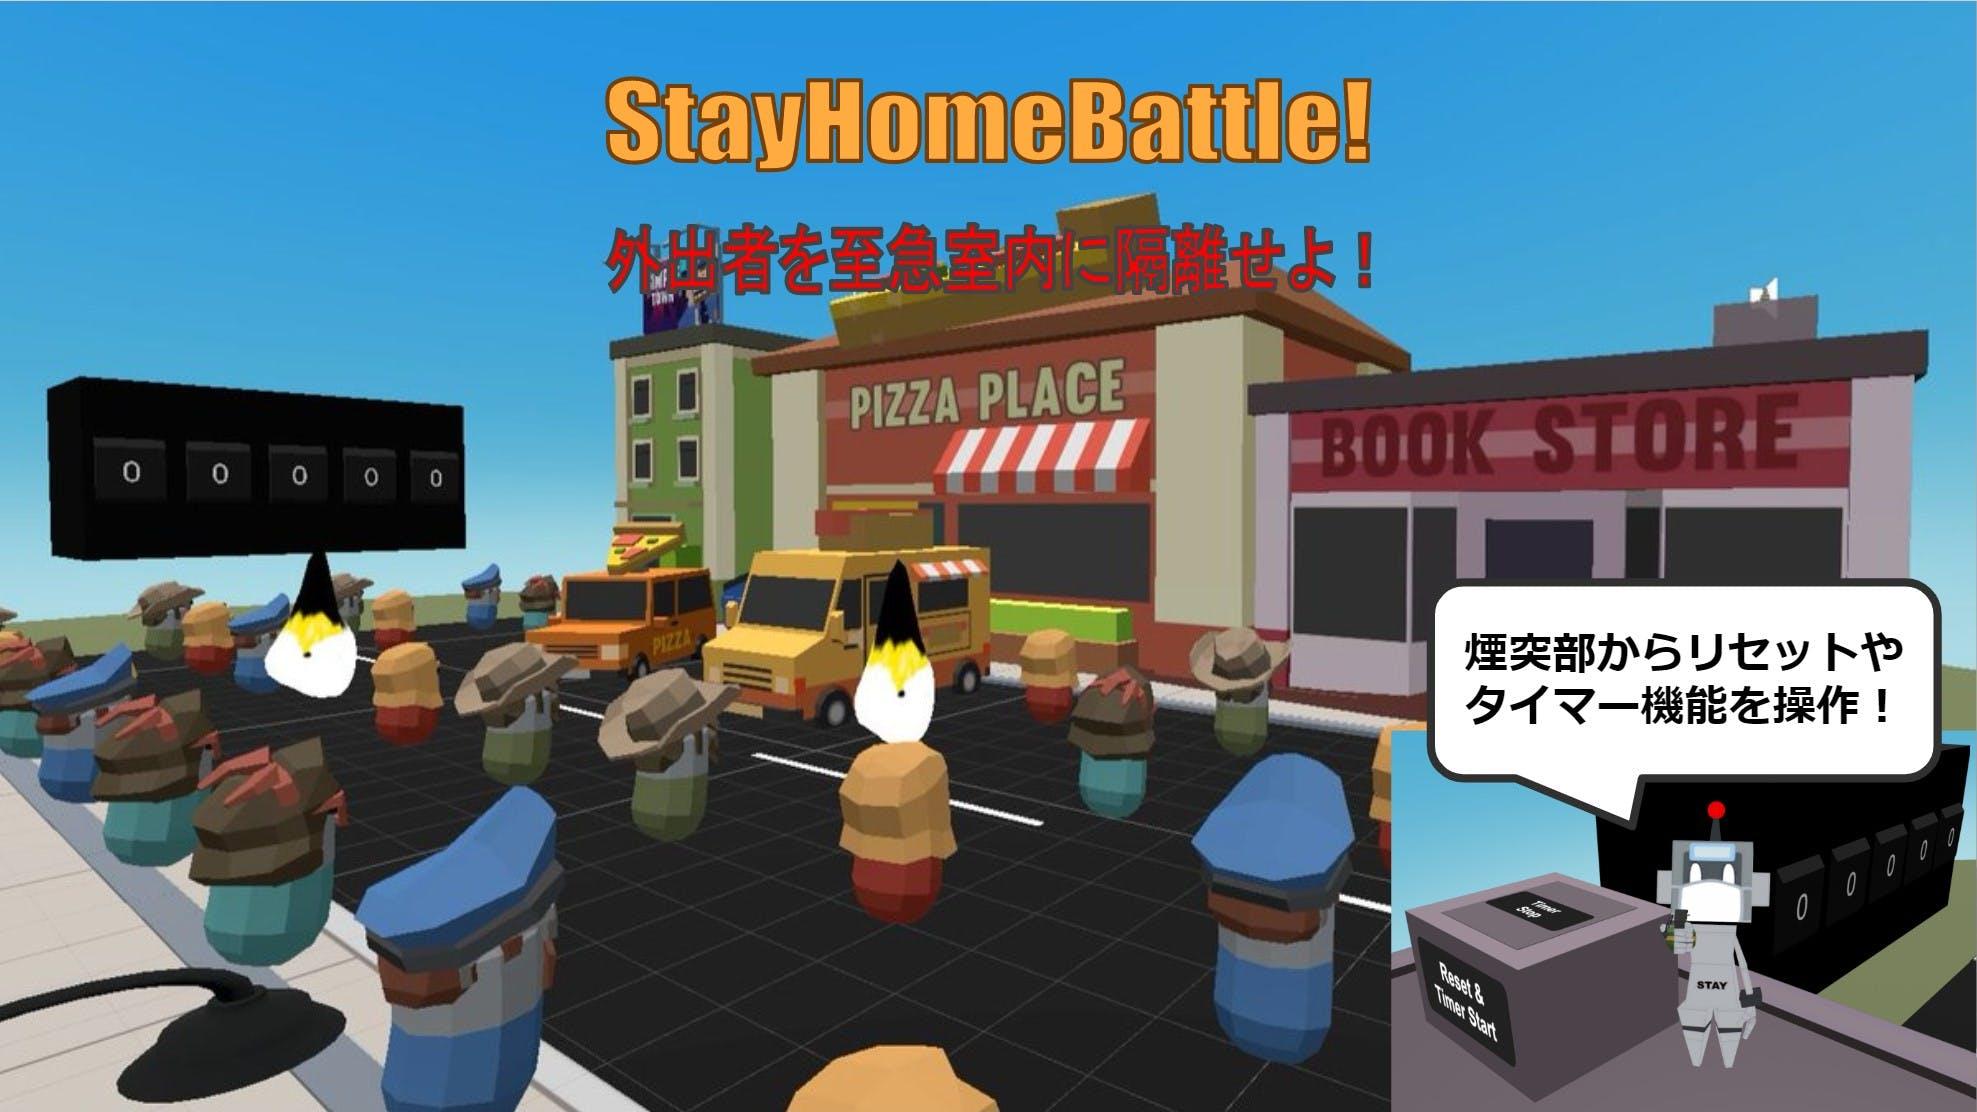 StayHomeBattle!